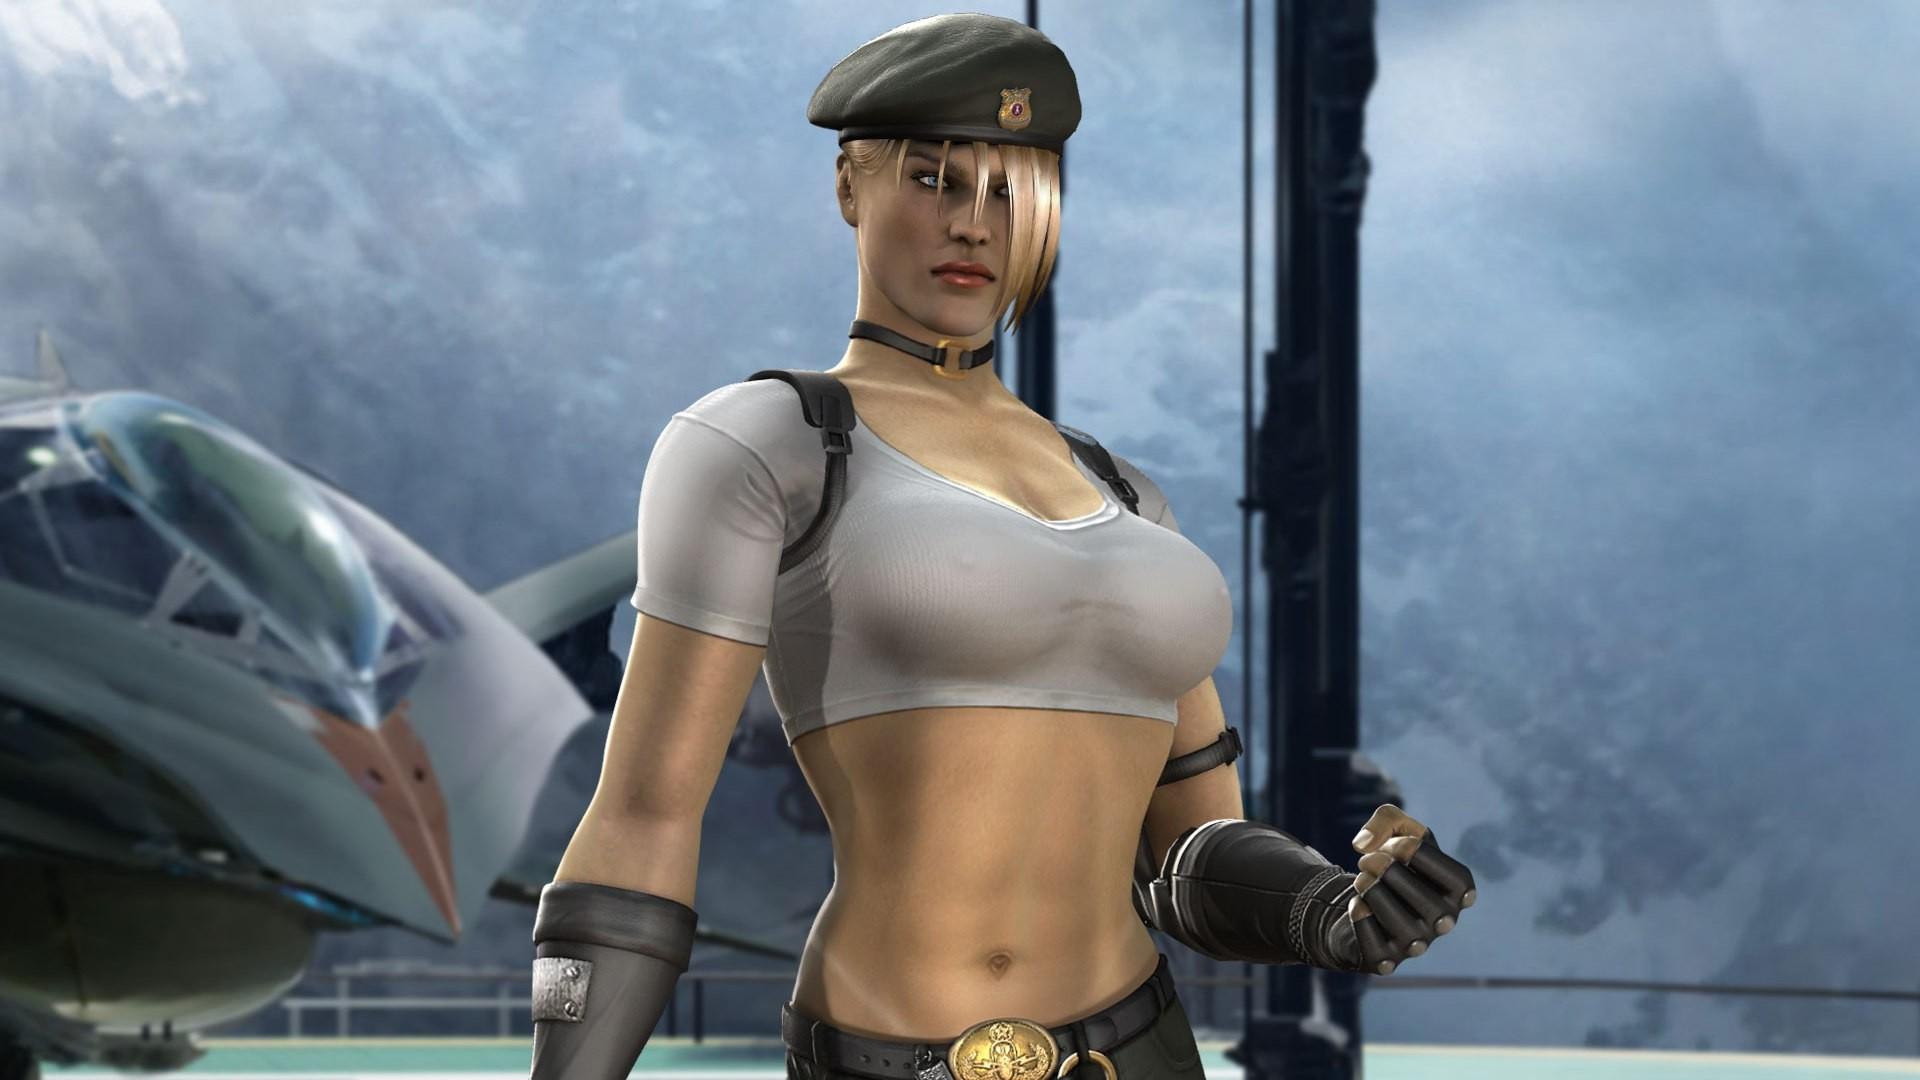 Wallpaper Sonya Blade Mortal Kombat Video Games